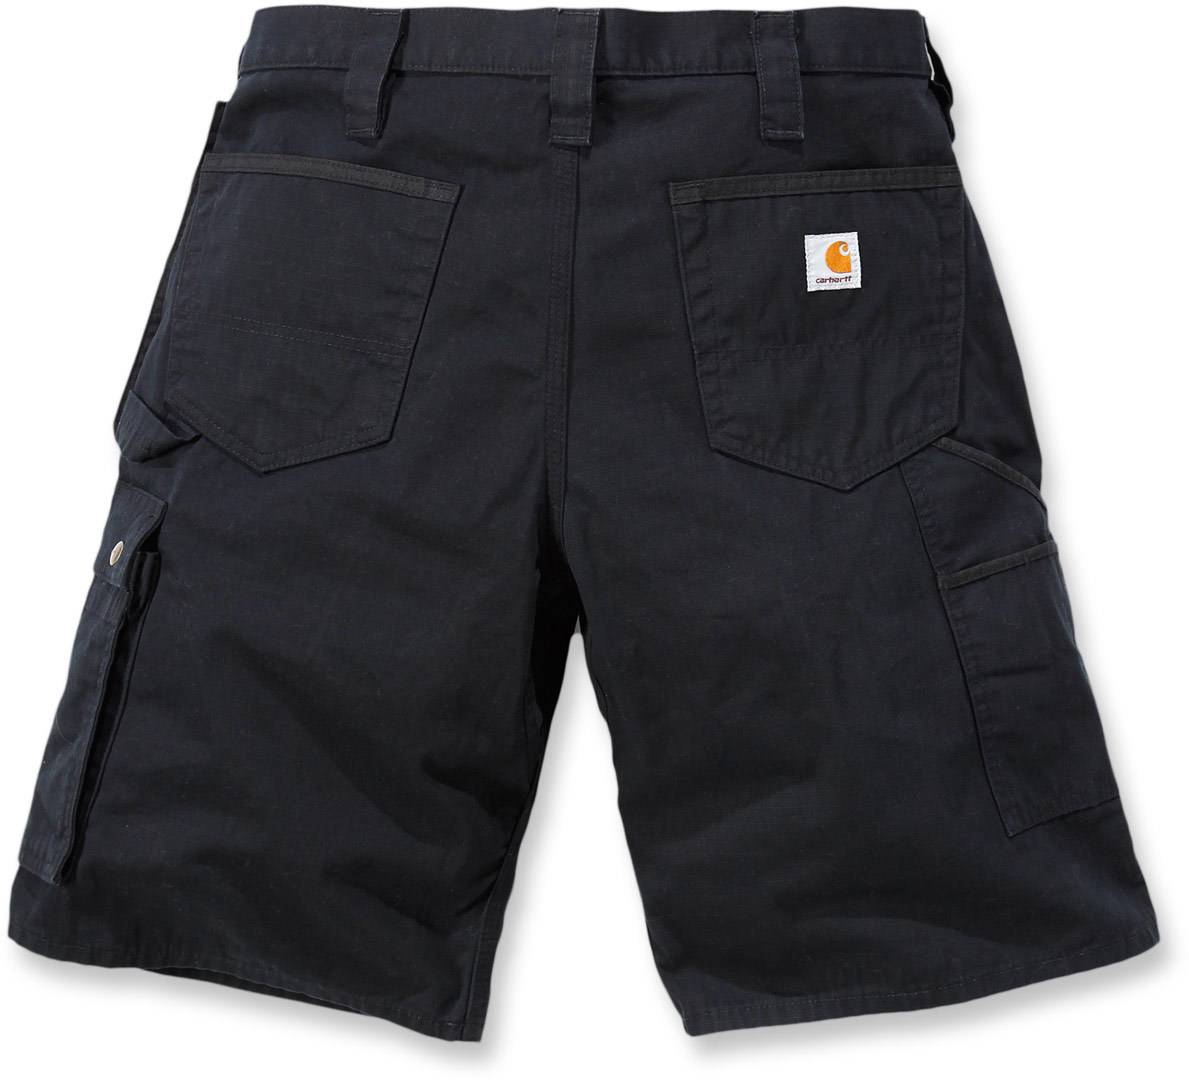 Carhartt Multi Pocket Ripstop Pantalones cortos Negro 30